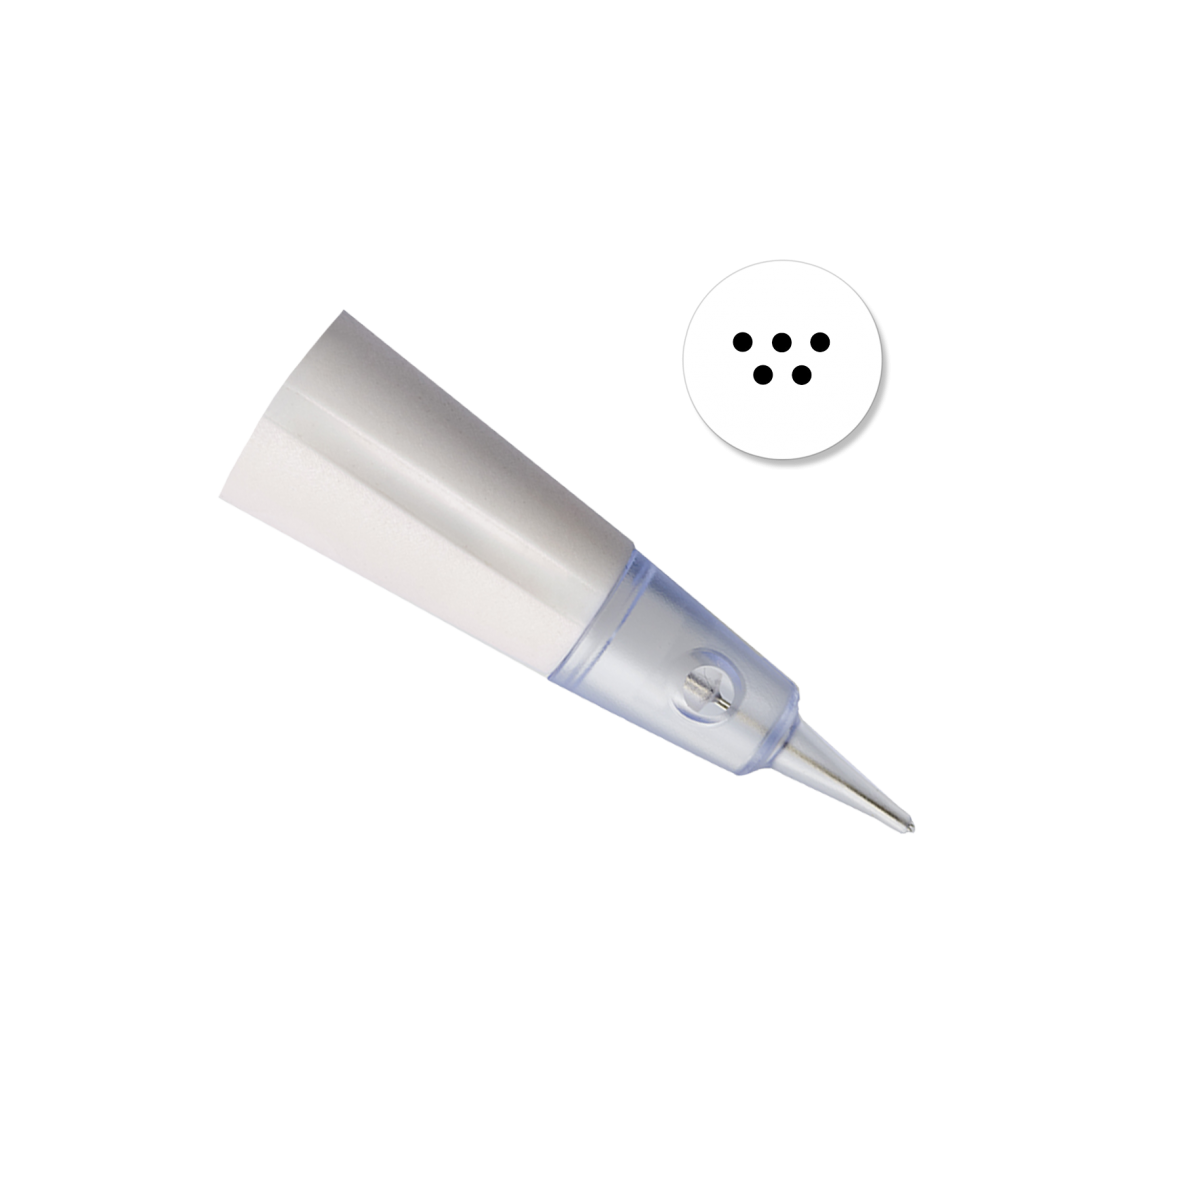 Stylo Genius - Amiea - 5 SPREAD (0,25 mm) GENIUS